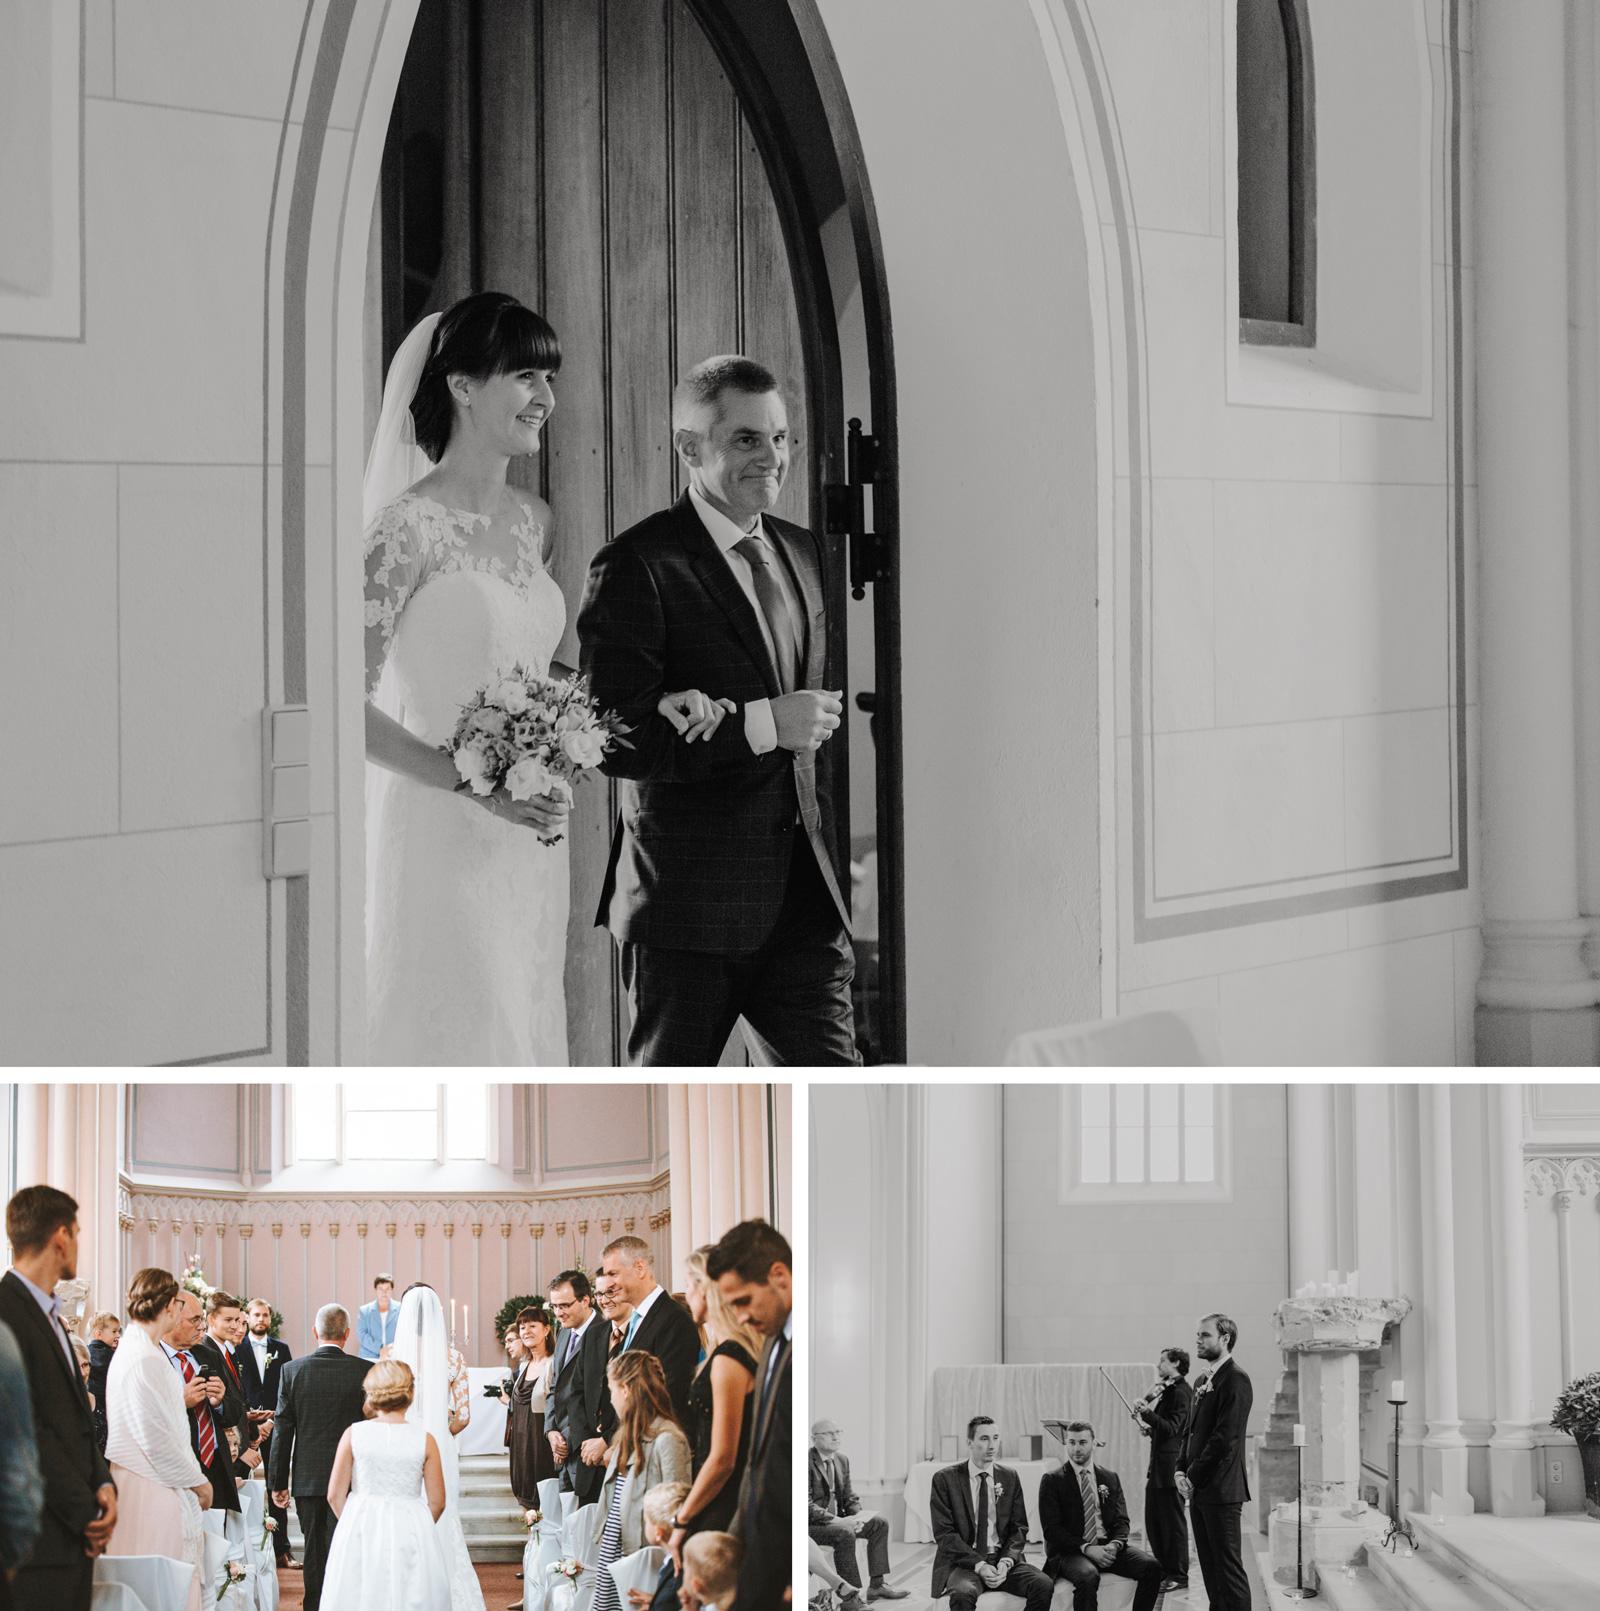 Hochzeitsfotos Museumsinsel Berlin Mitte Paarfotos